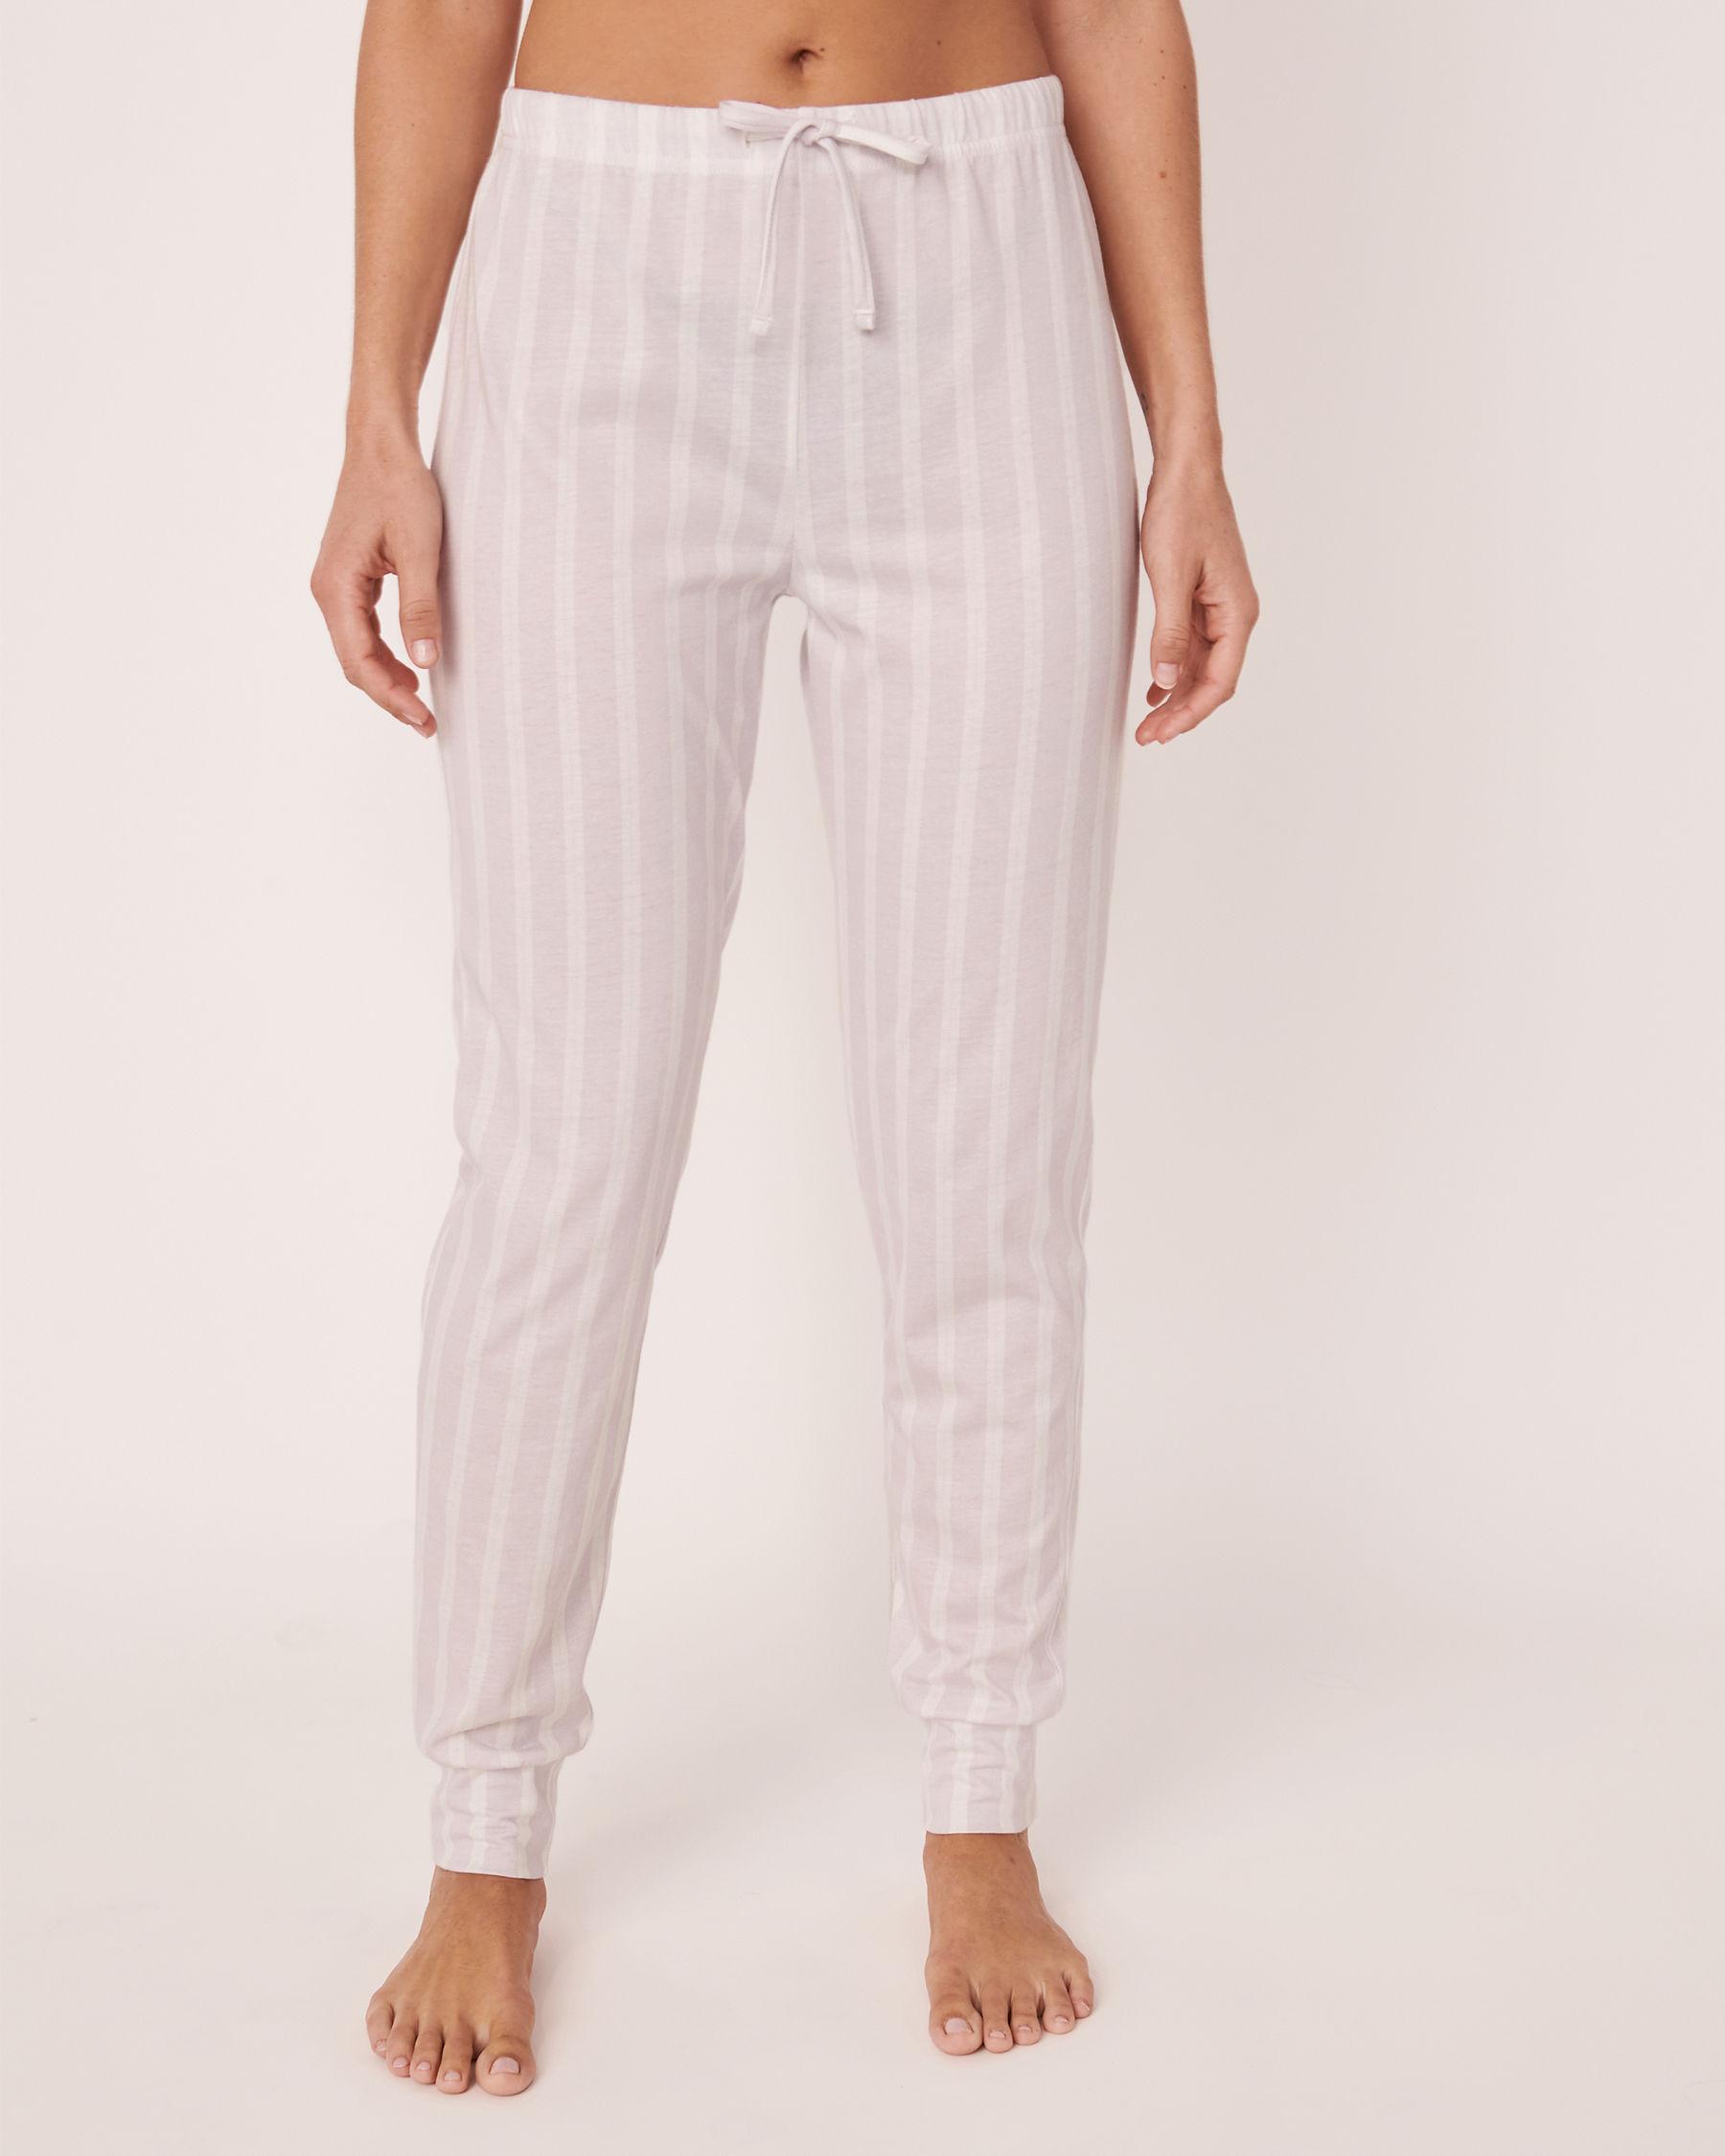 LA VIE EN ROSE Fitted Pyjama Pant Stripes 40200157 - View1